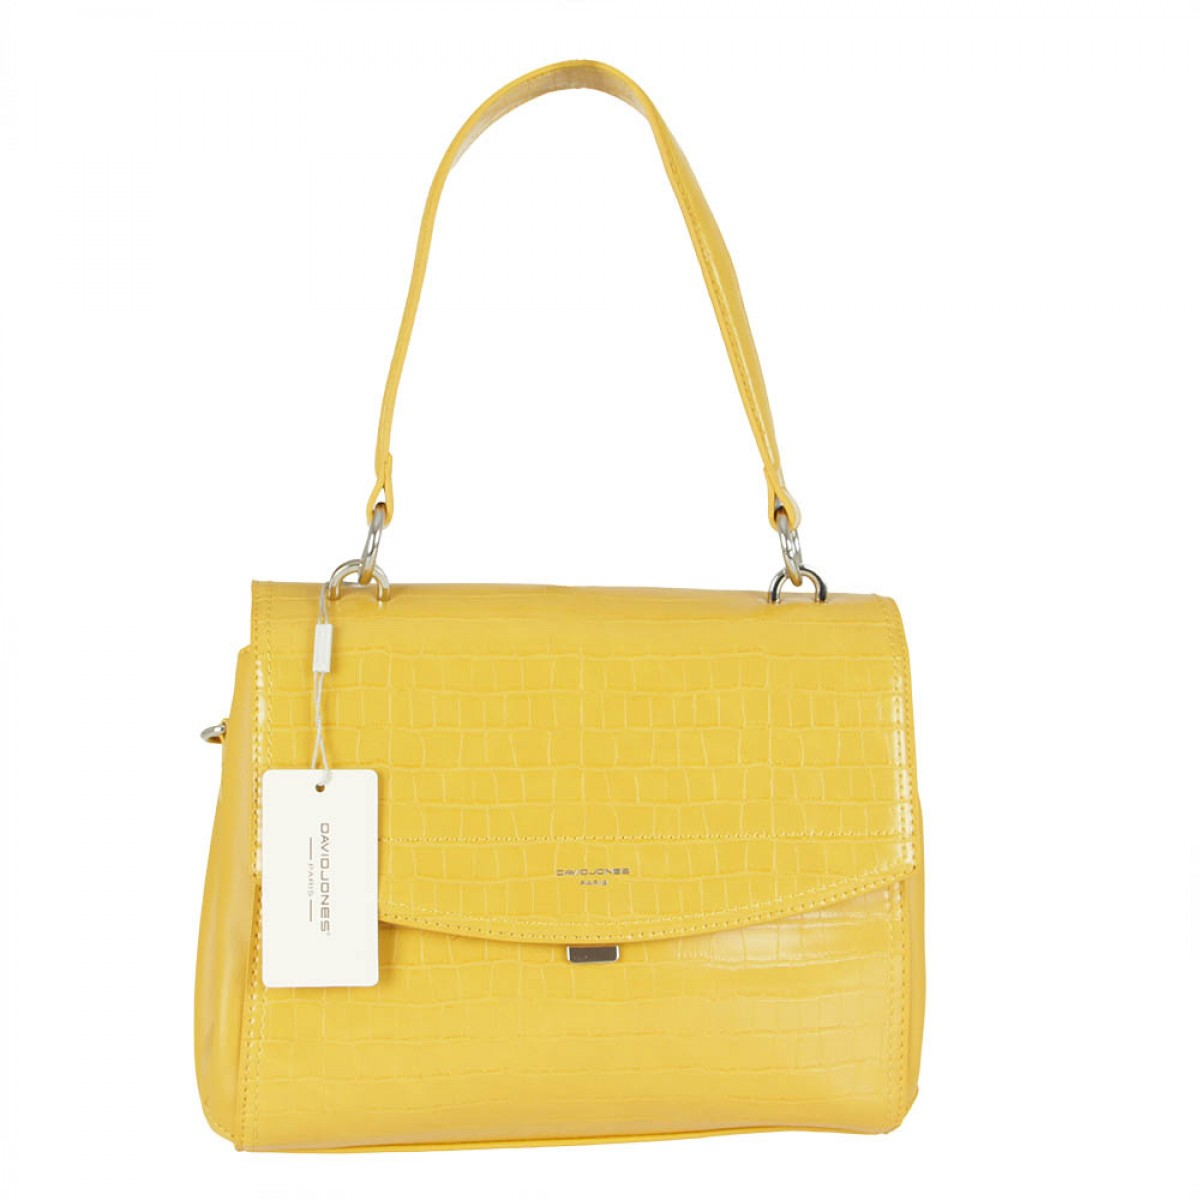 Жіноча сумка David Jones 6148-2 MUSTARD